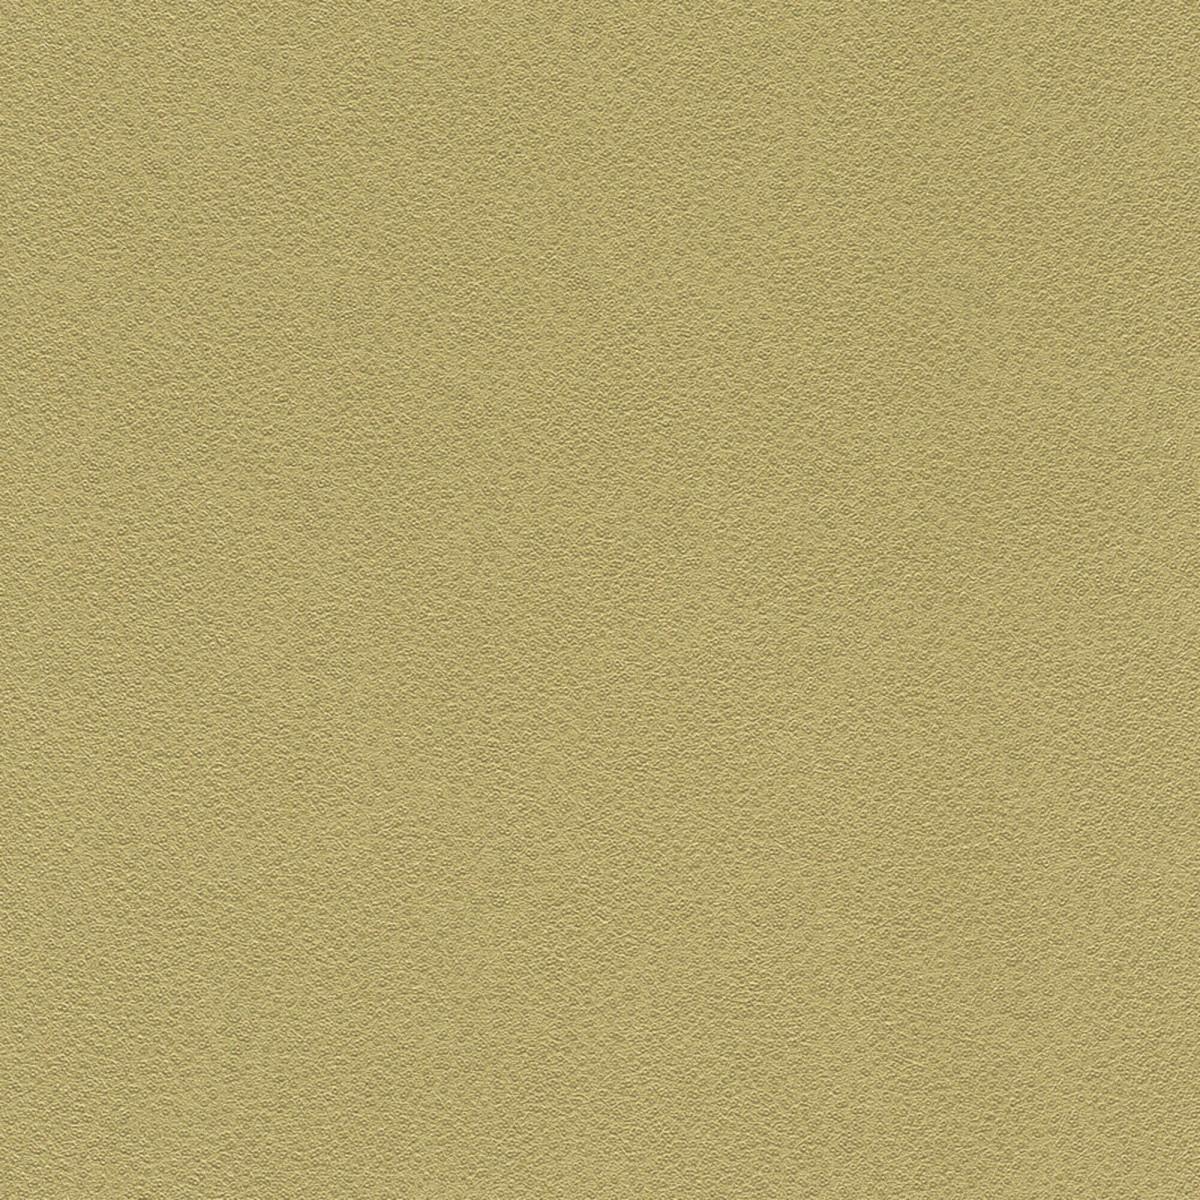 Обои флизелиновые Rasch Miracle желтые 422061 0.53 м